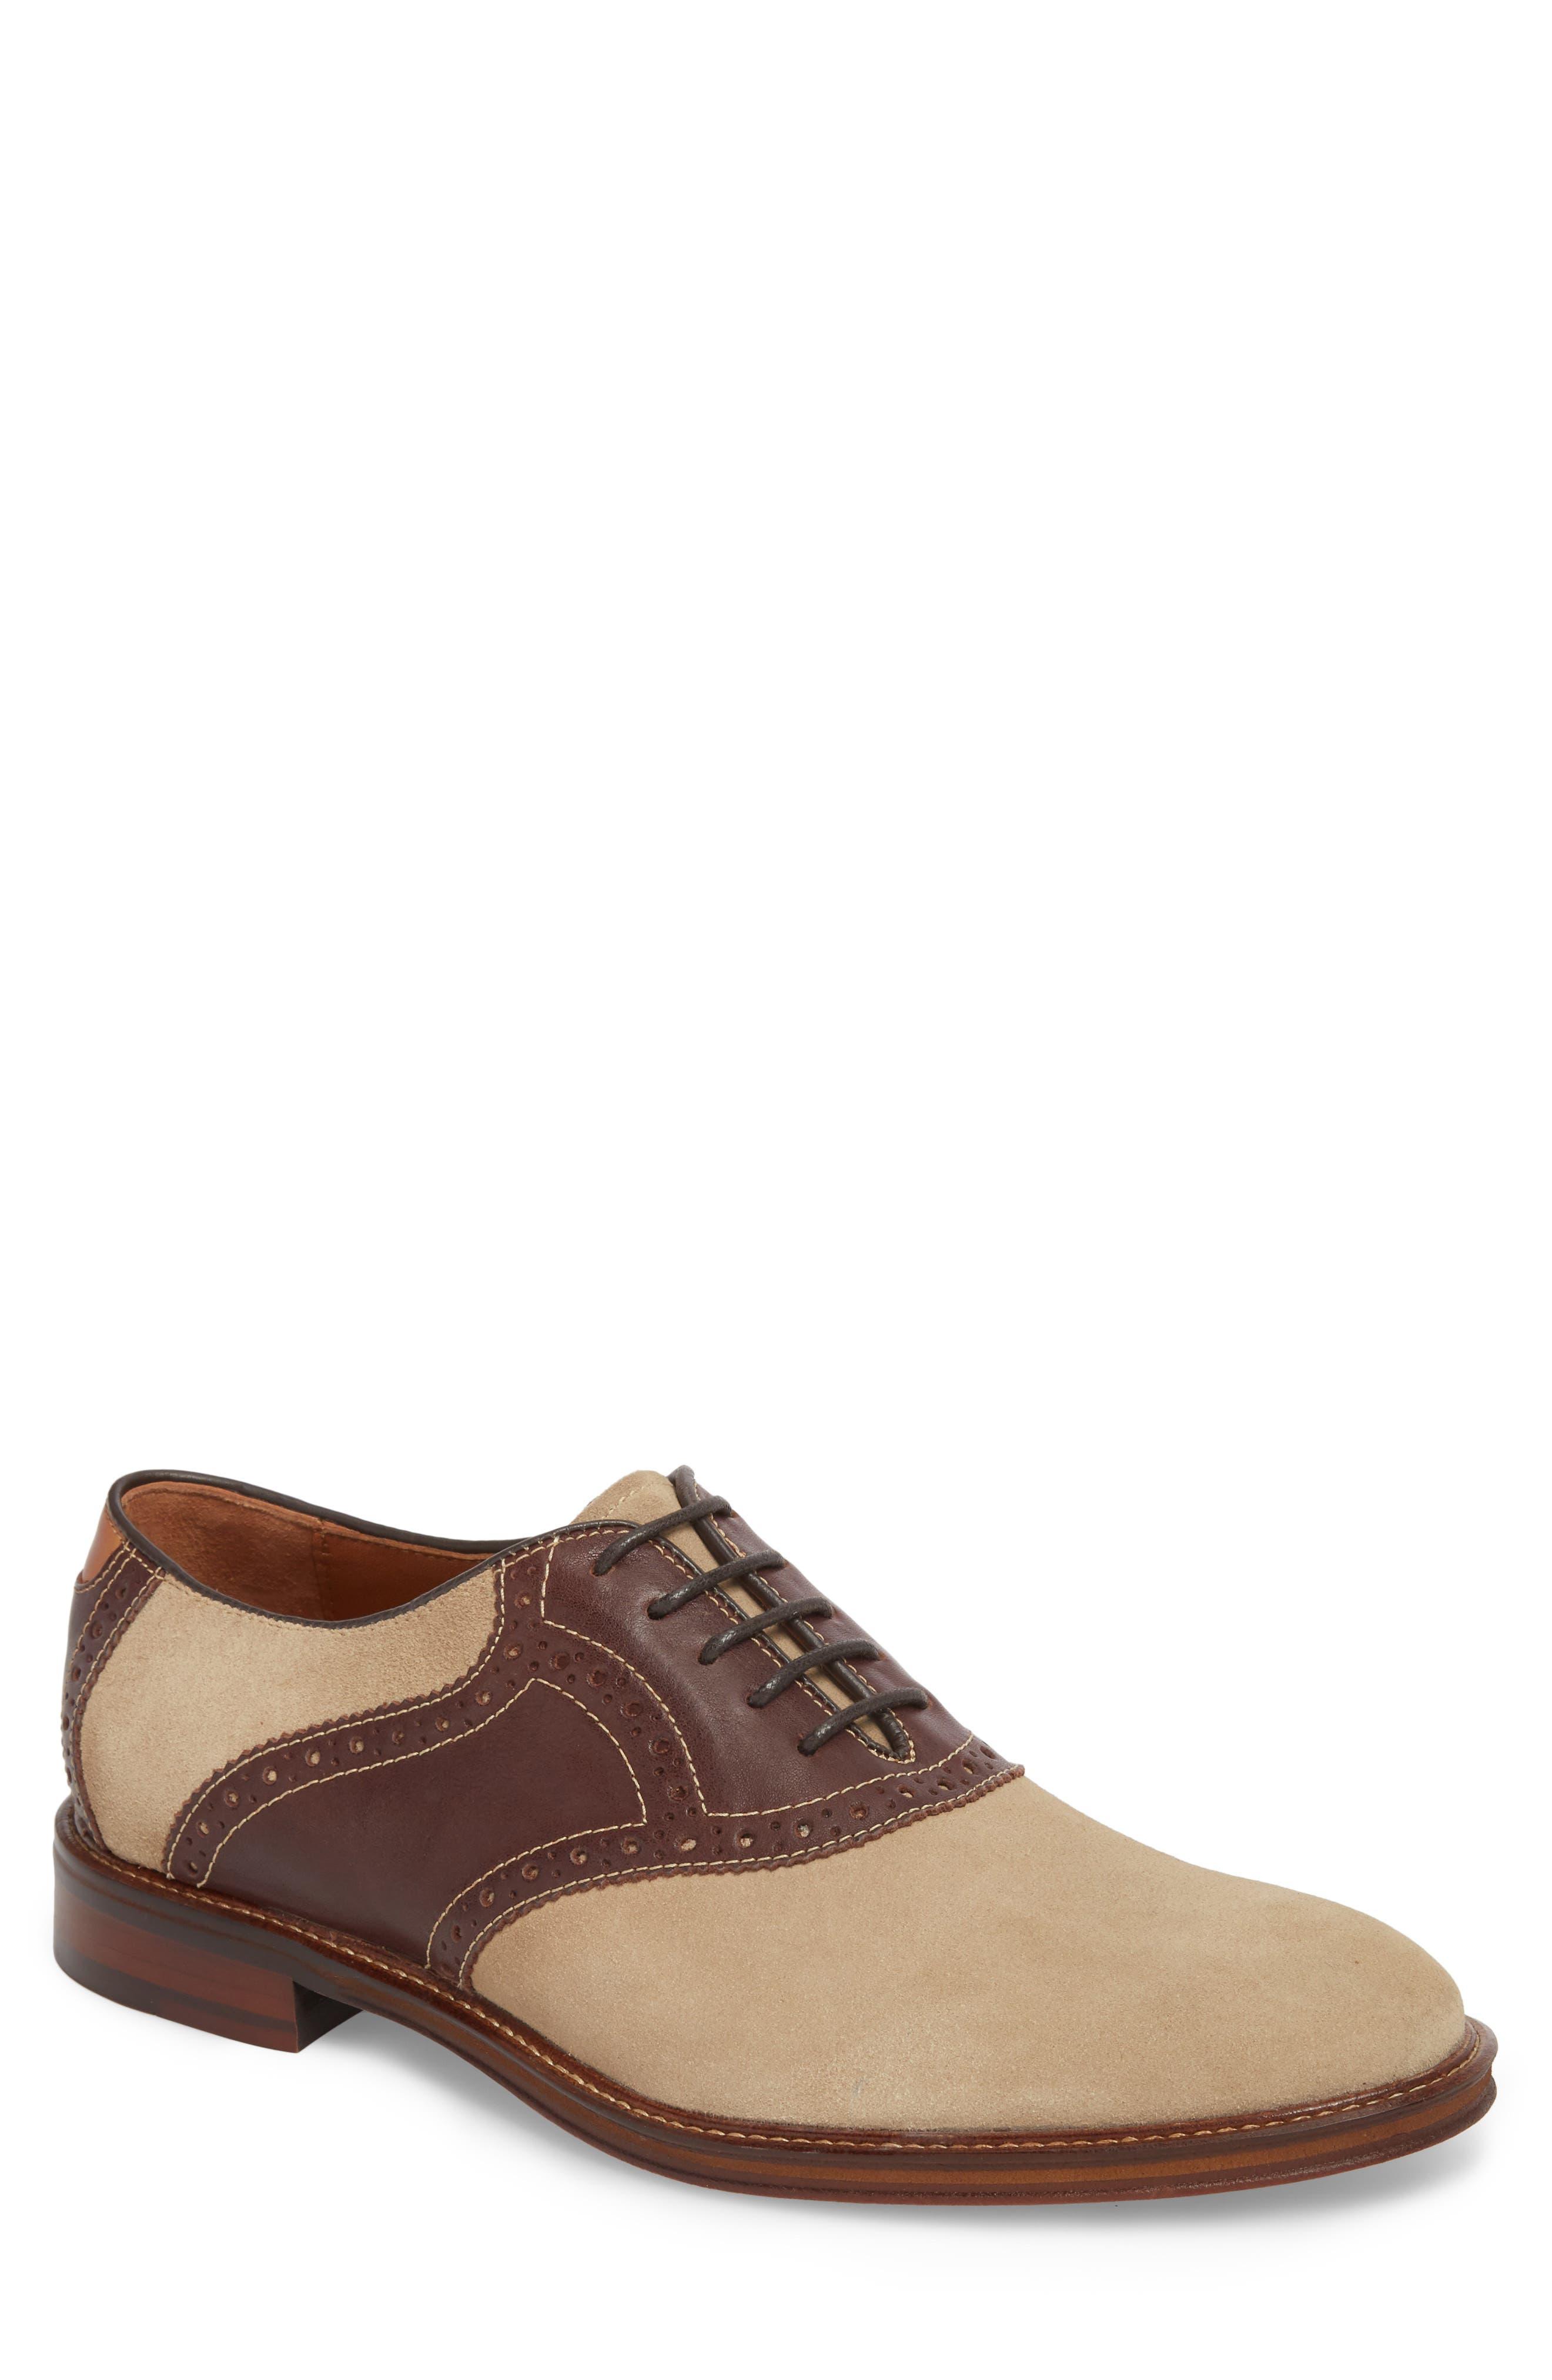 Warner Saddle Shoe,                             Main thumbnail 1, color,                             Camel Nubuck